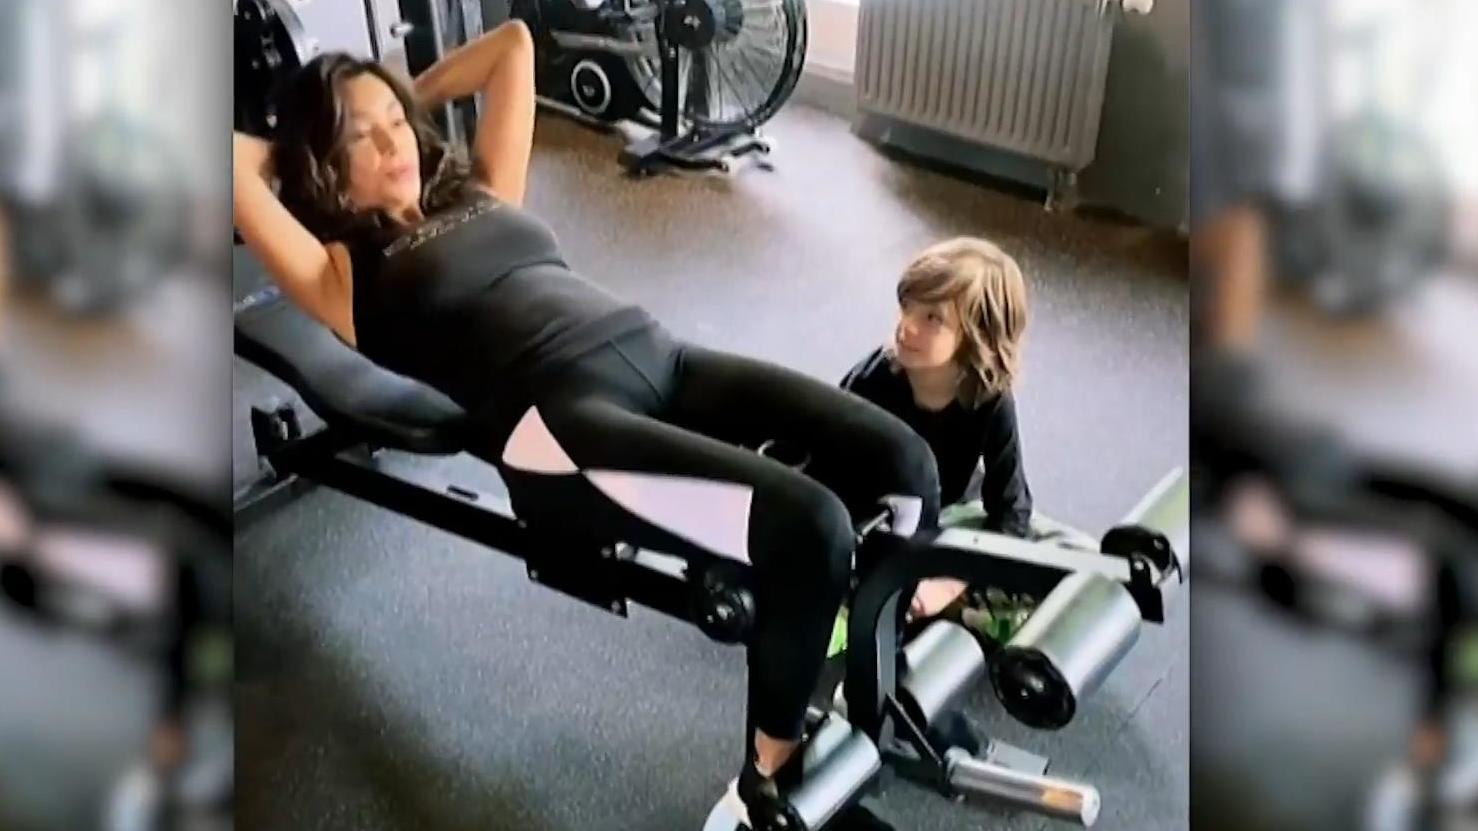 verona-sohn-rocco-beim-sport-fitness-duell-wer-ist-fitter